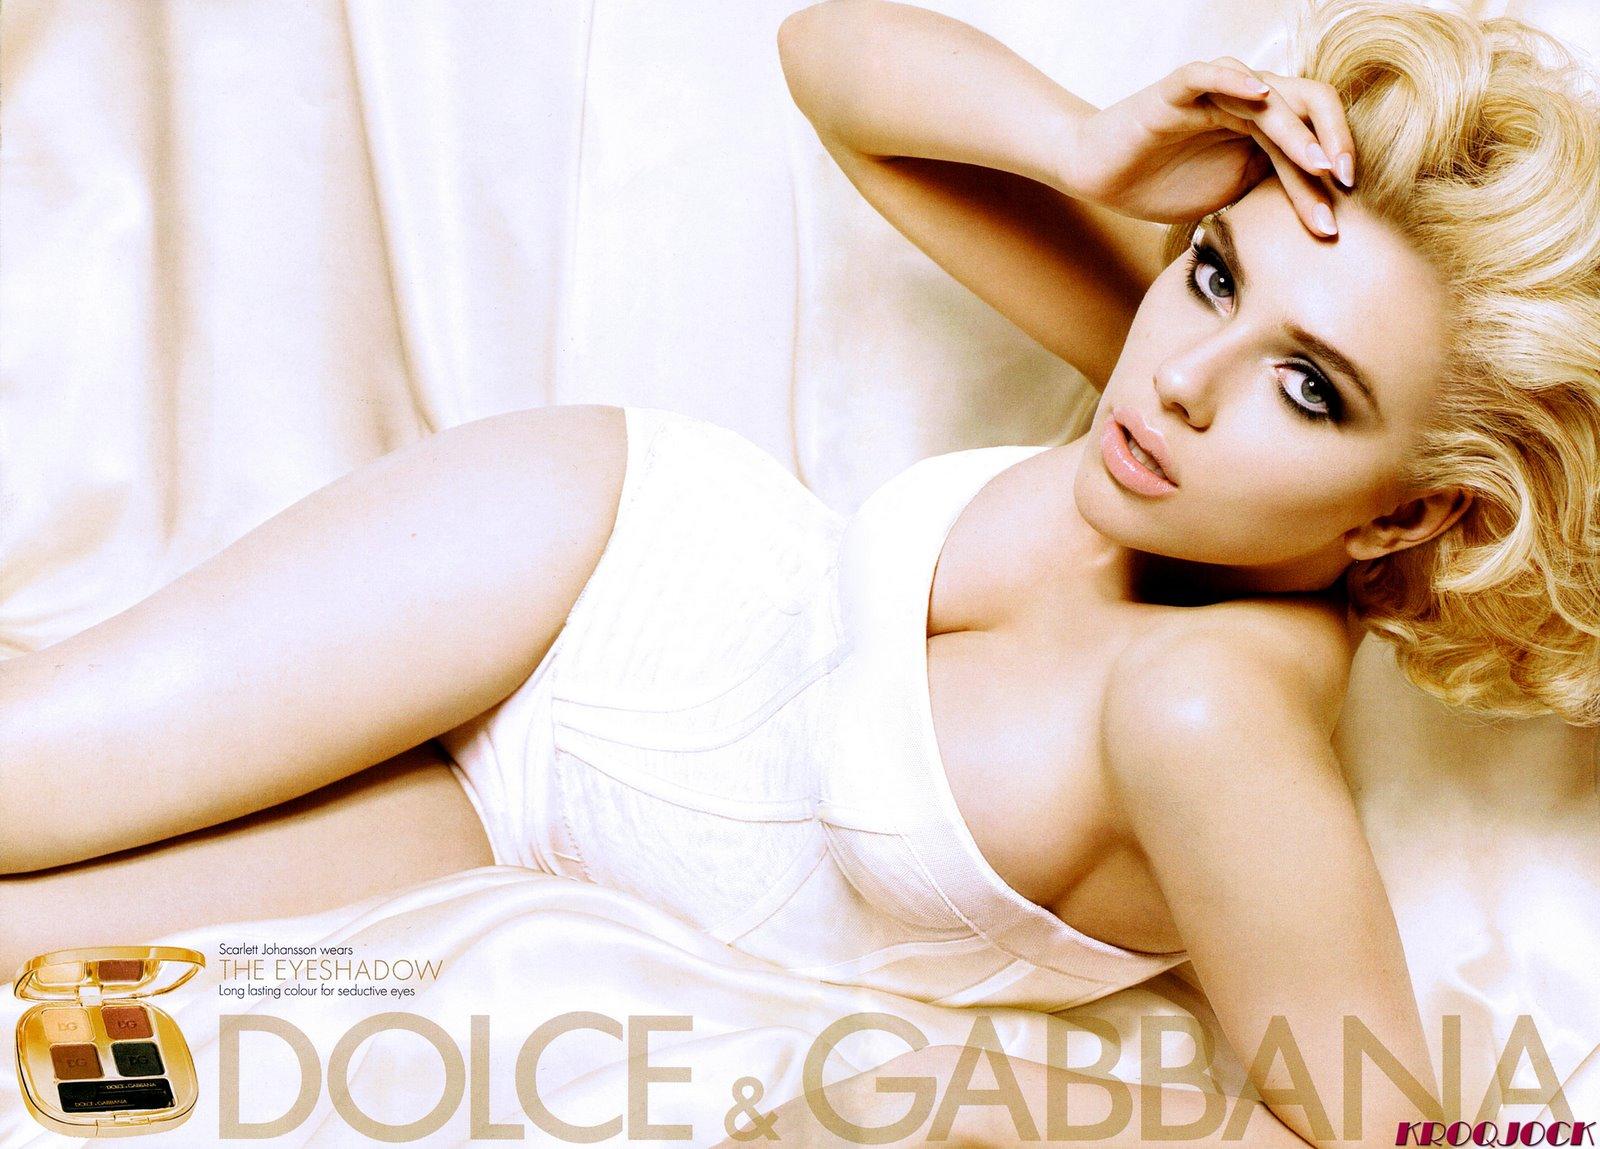 http://1.bp.blogspot.com/-RuY_98E4d6o/T7Mp_N6MQ8I/AAAAAAAAIFY/gXIvIppkaos/s1600/Scarlett_Johansson+%282%29.jpg